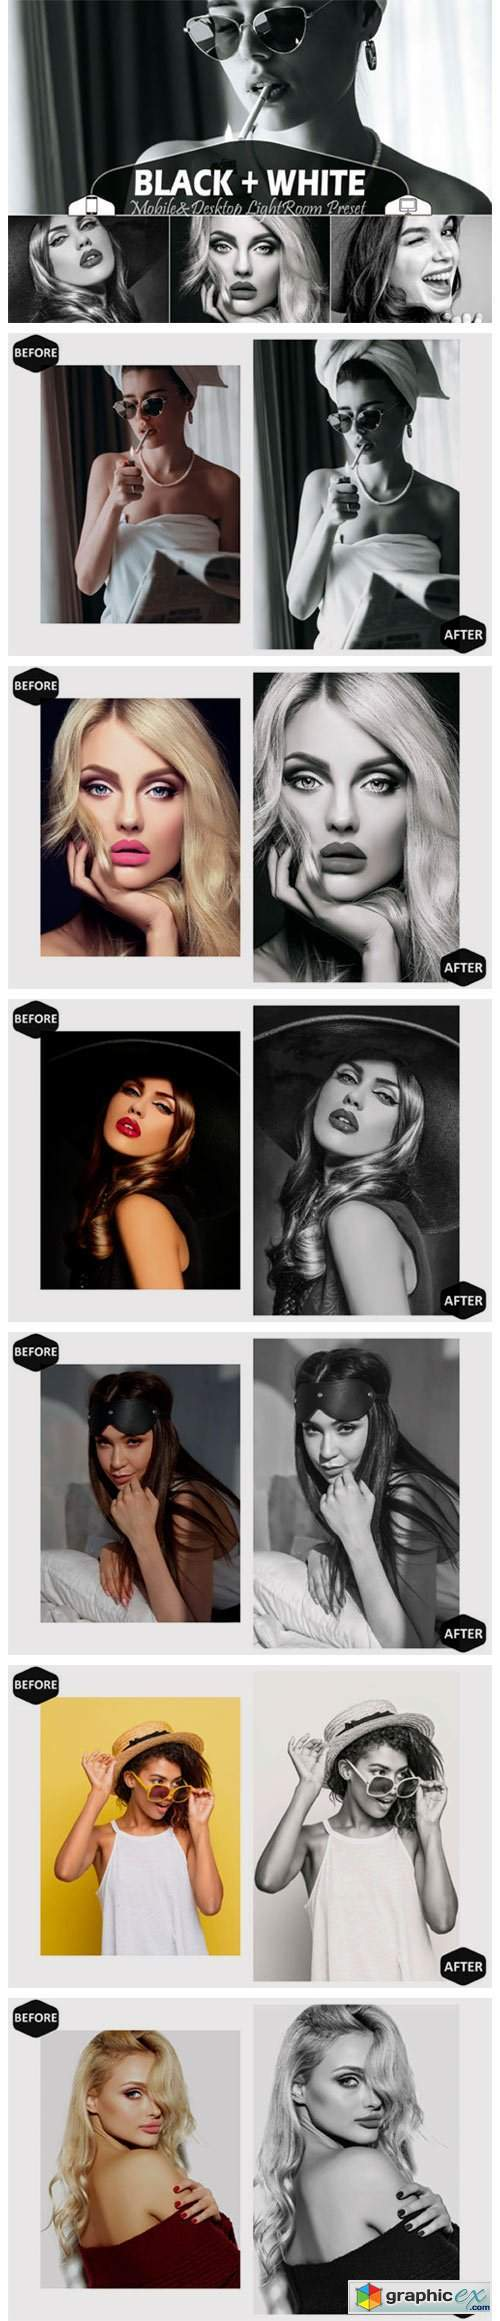 18 Black+White Lightroom Presets